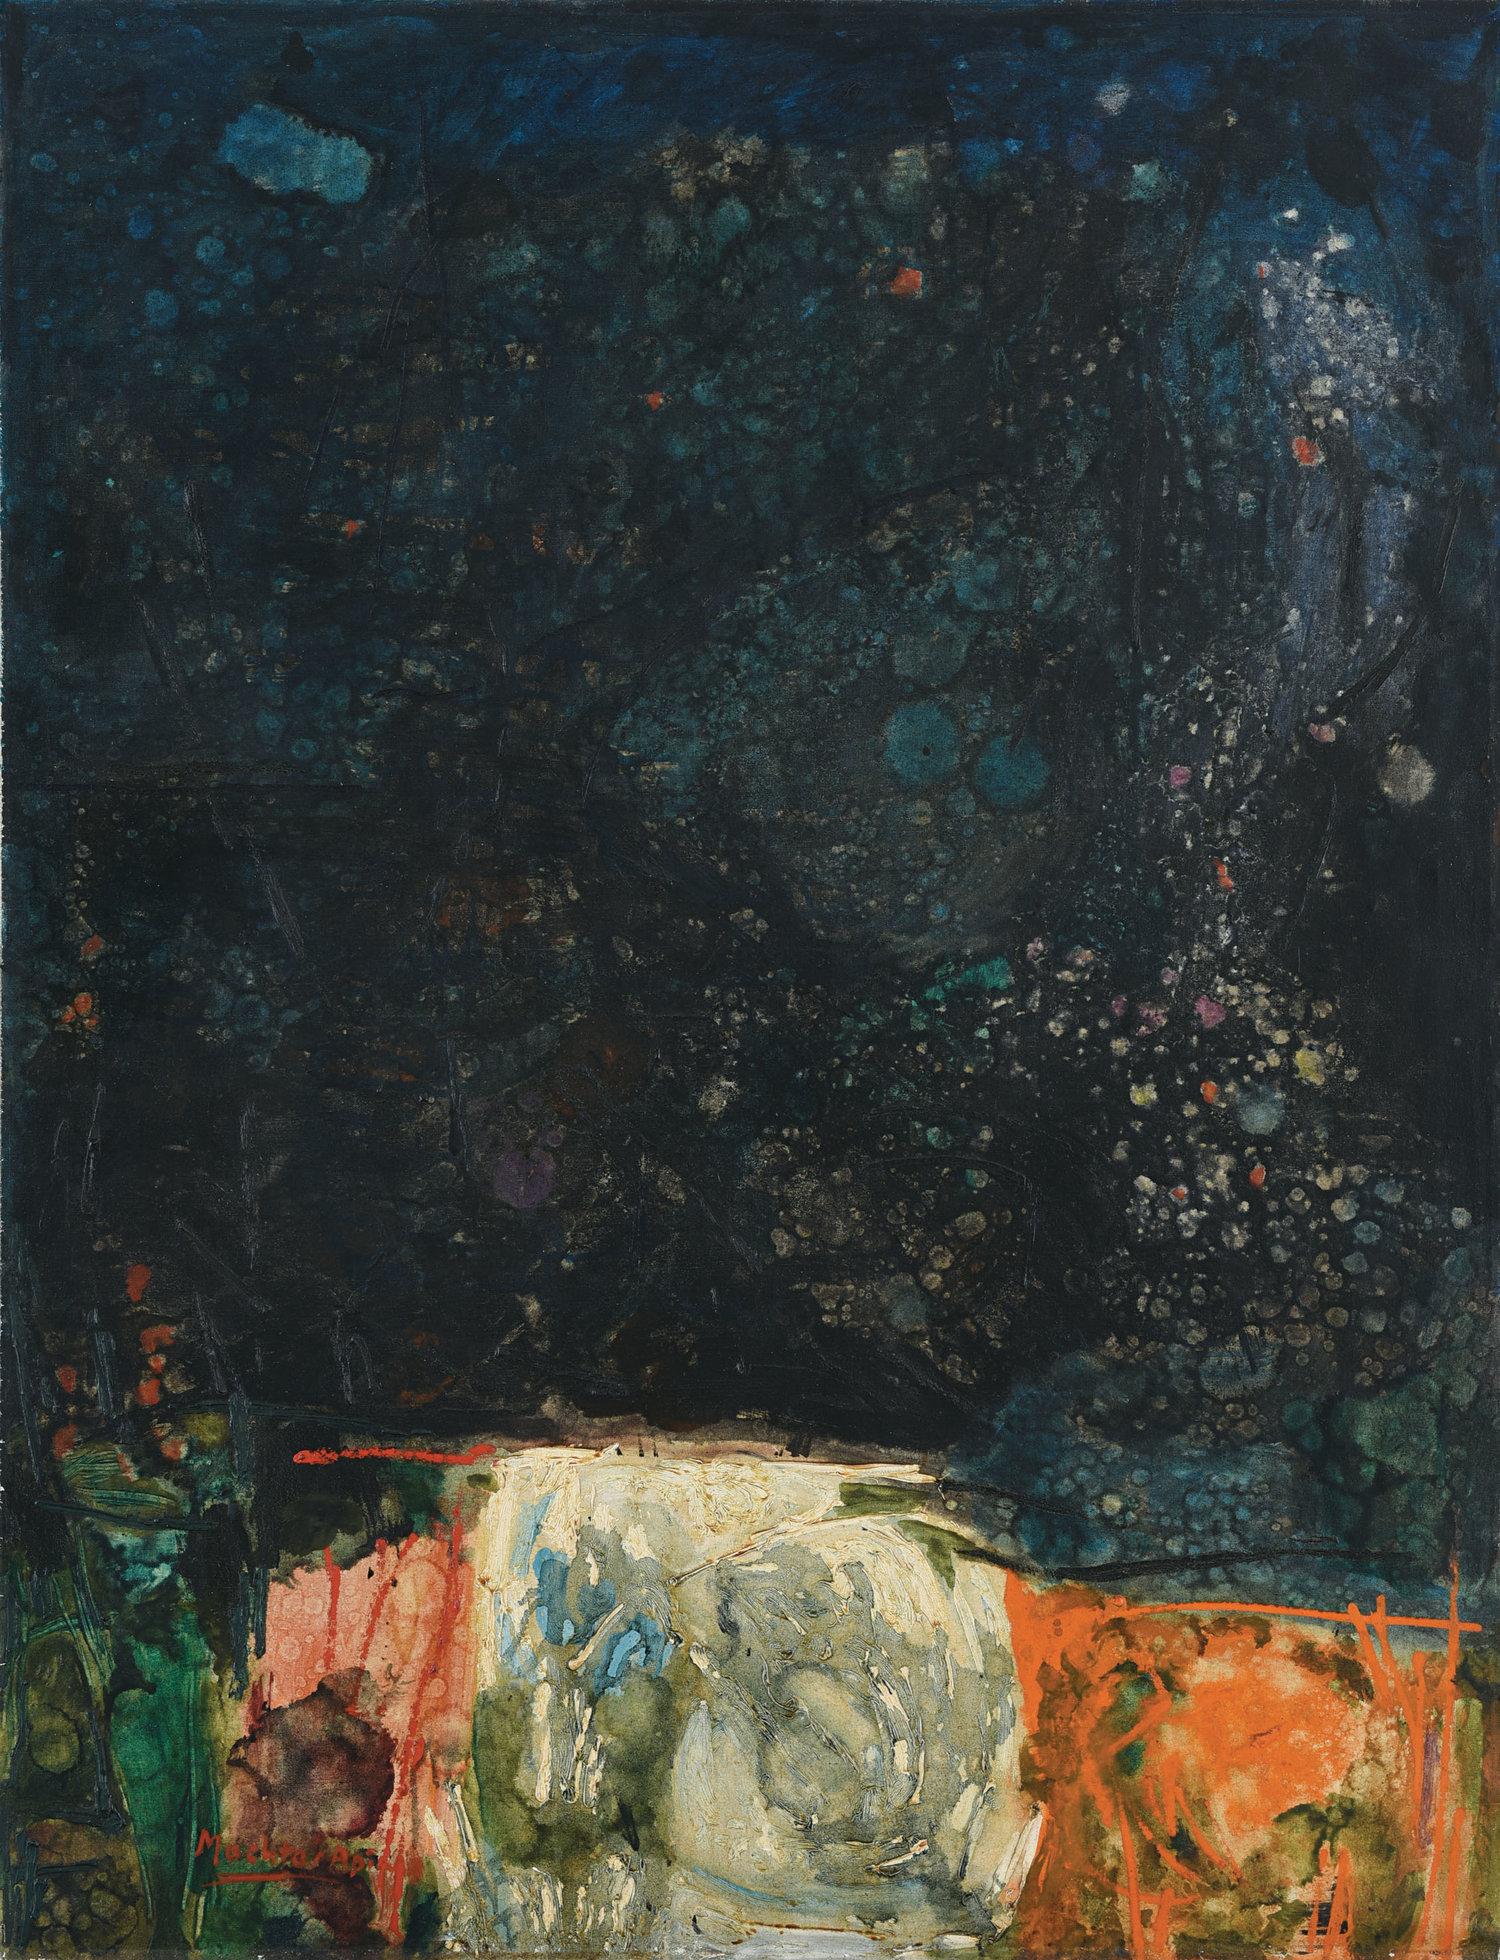 Mochtar Apin, Mendung (Cloudy), oil on canvas, 117 x 89 cm, 1964